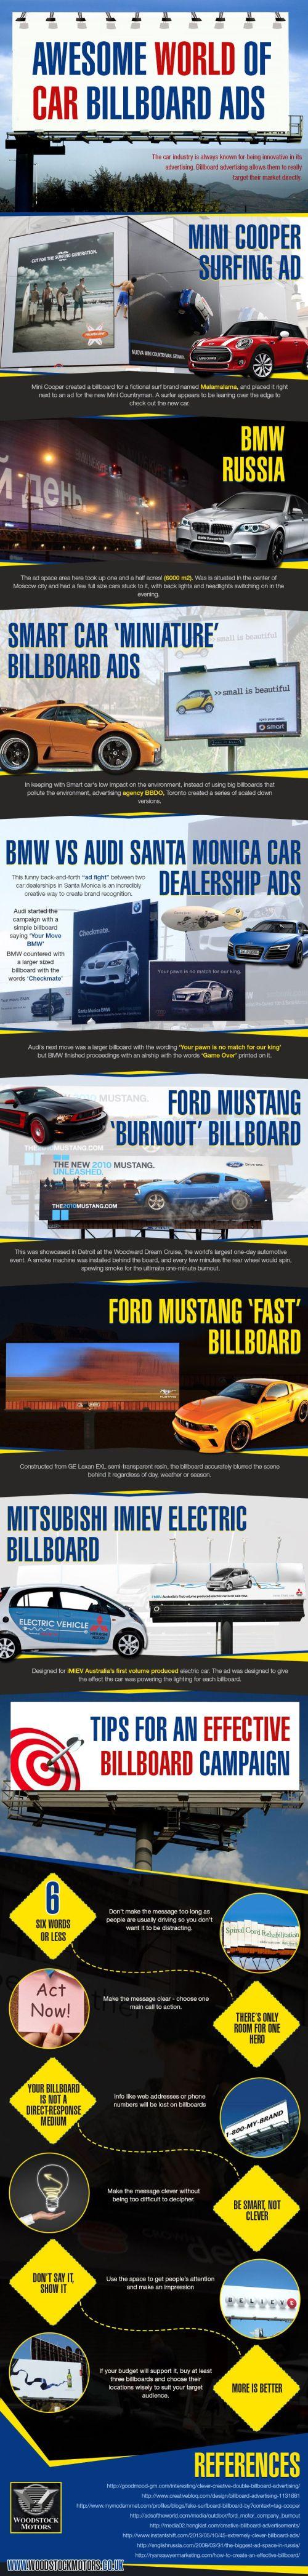 Car-Billboard-Ads-Infographic